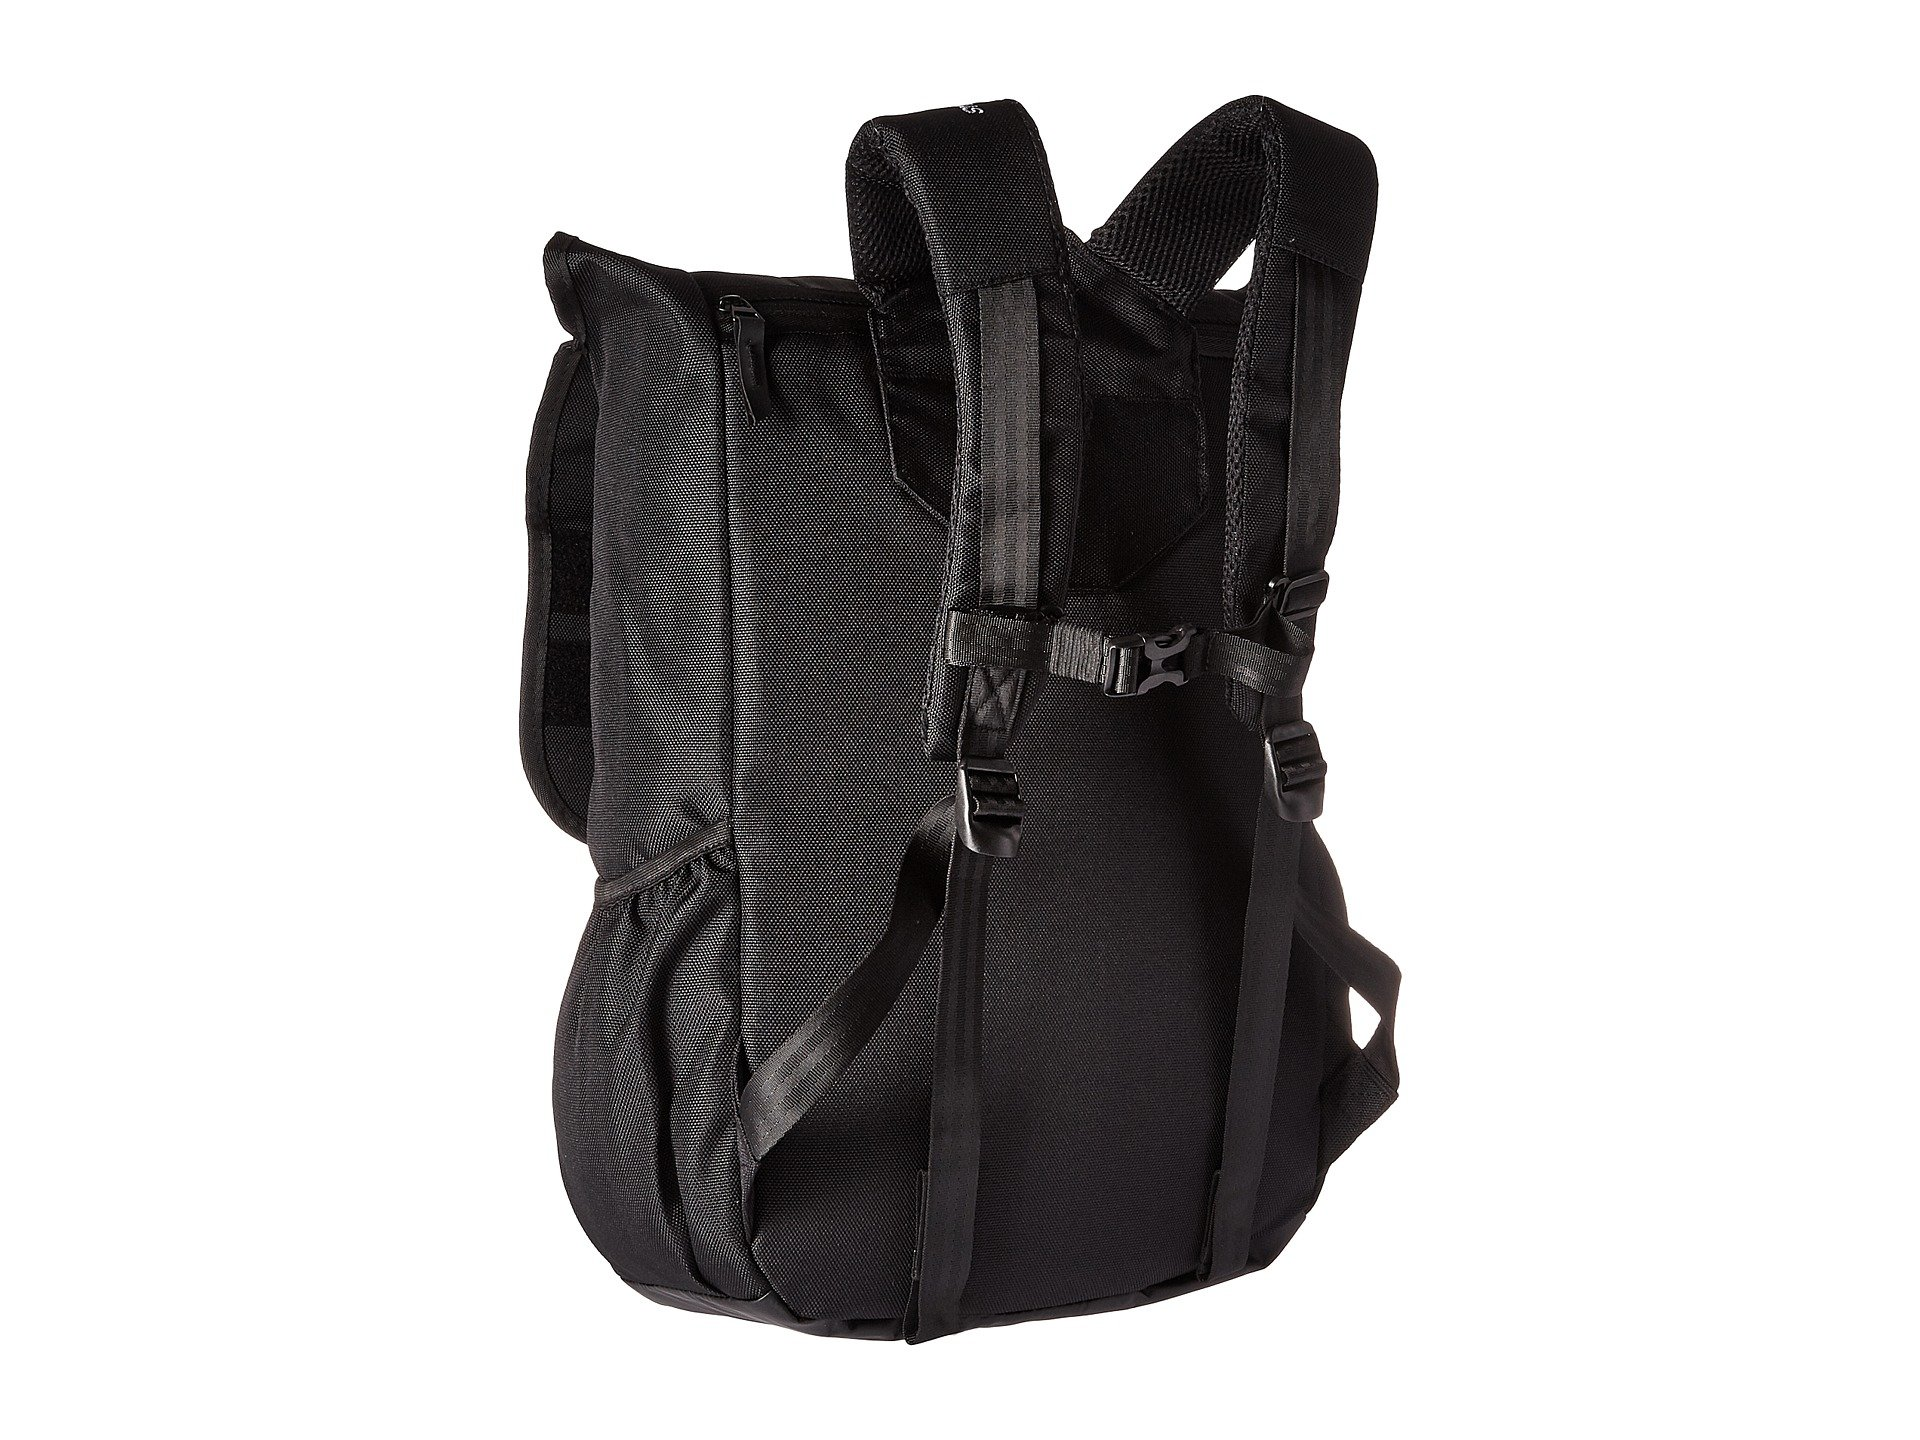 Epic Flyer Plus Travelgear Backpack Proton Black PqPTw7Sr